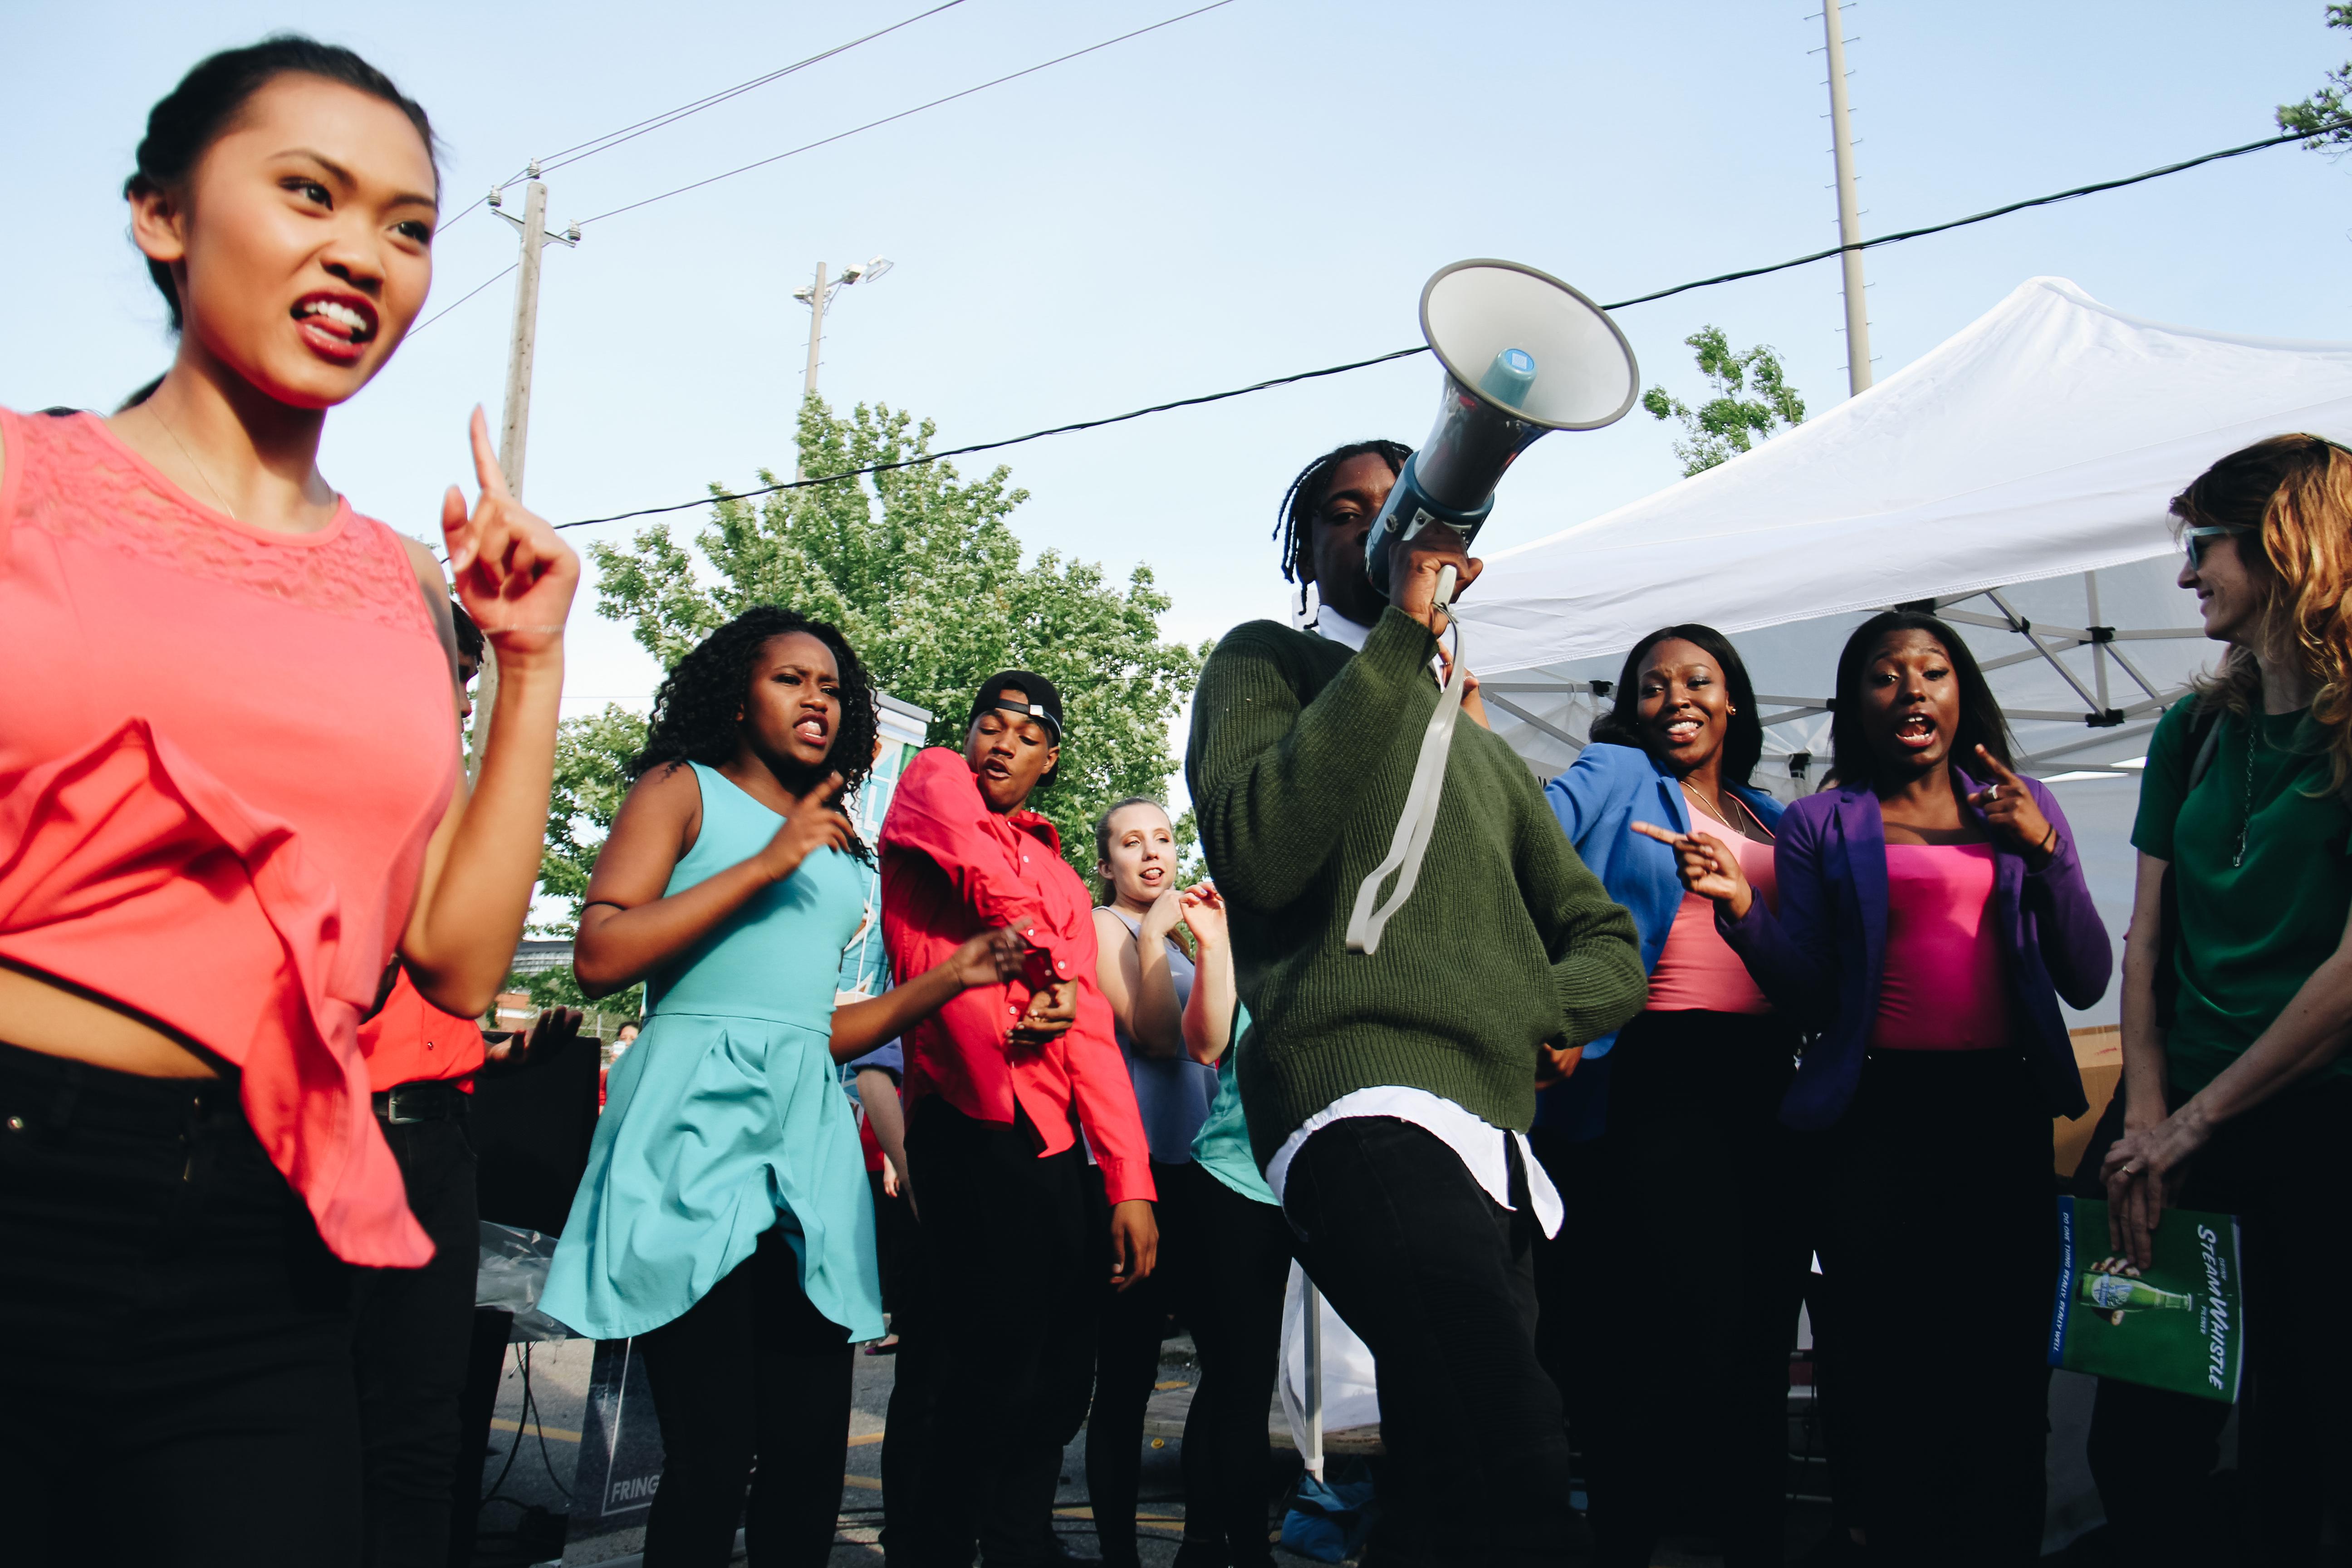 Teens dancing and having fun during the Teenjur Young Critics Program